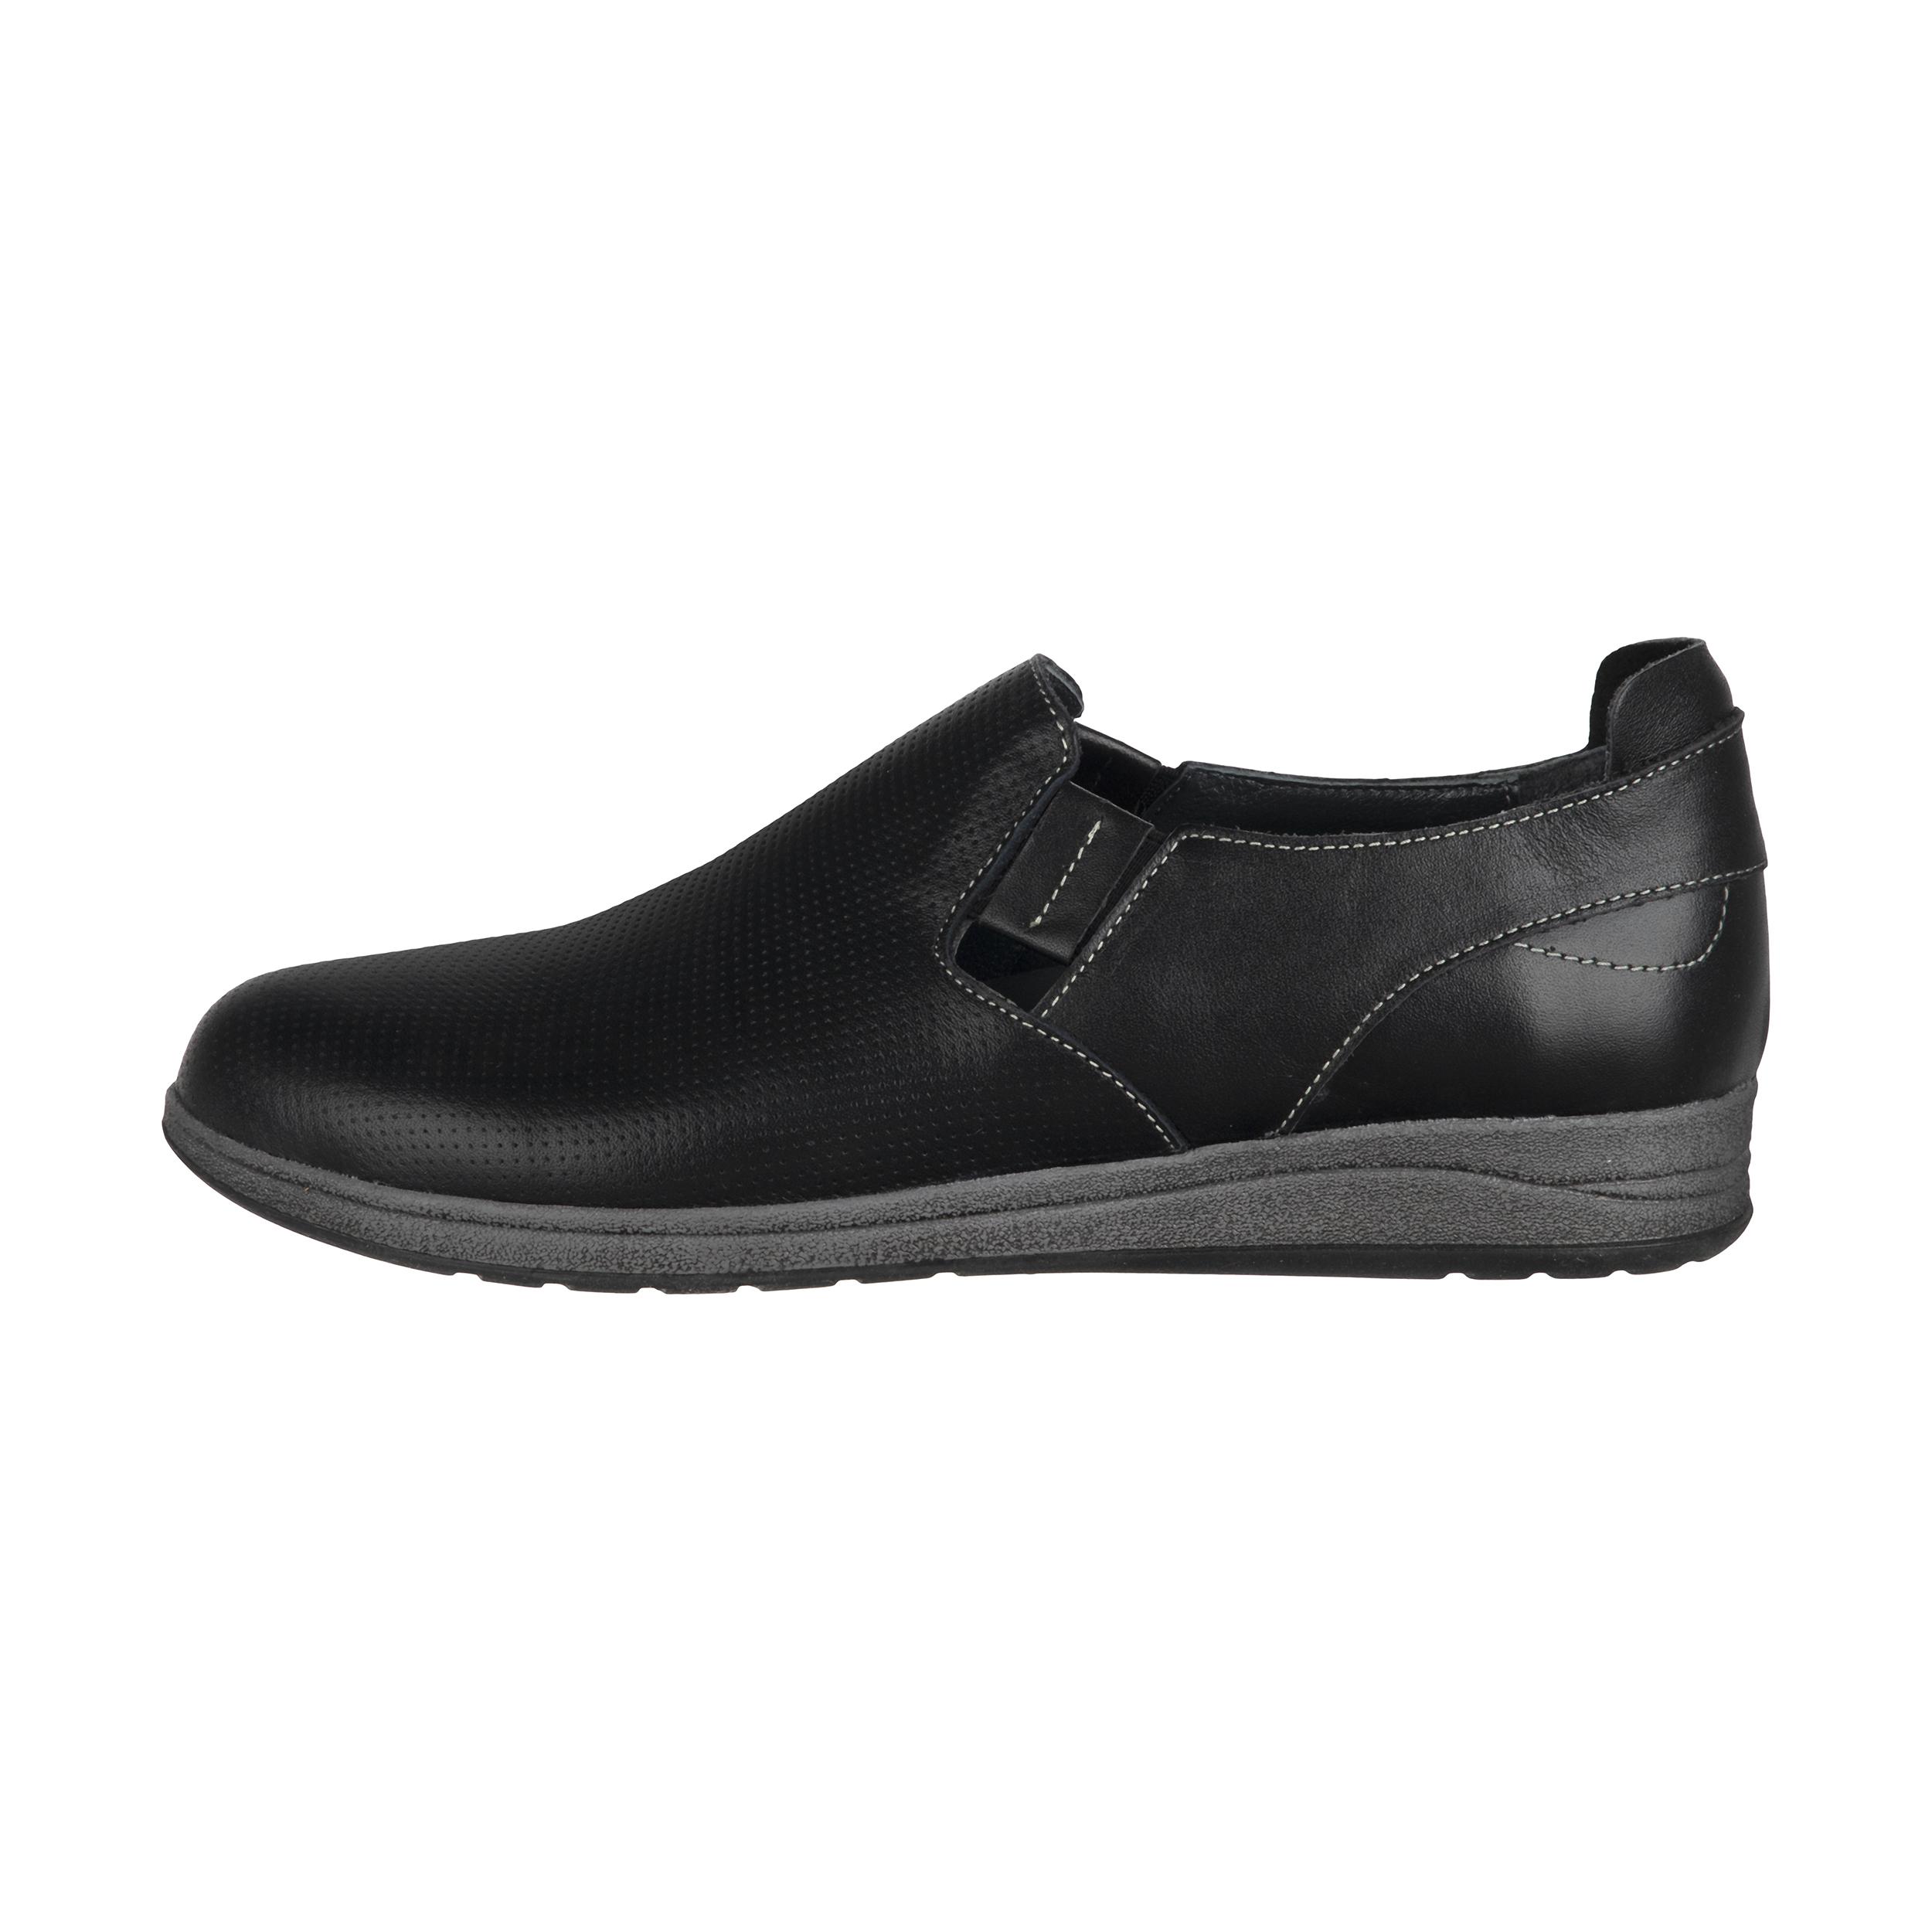 کفش روزمره زنانه سوته مدل 2958D500101 -  - 2